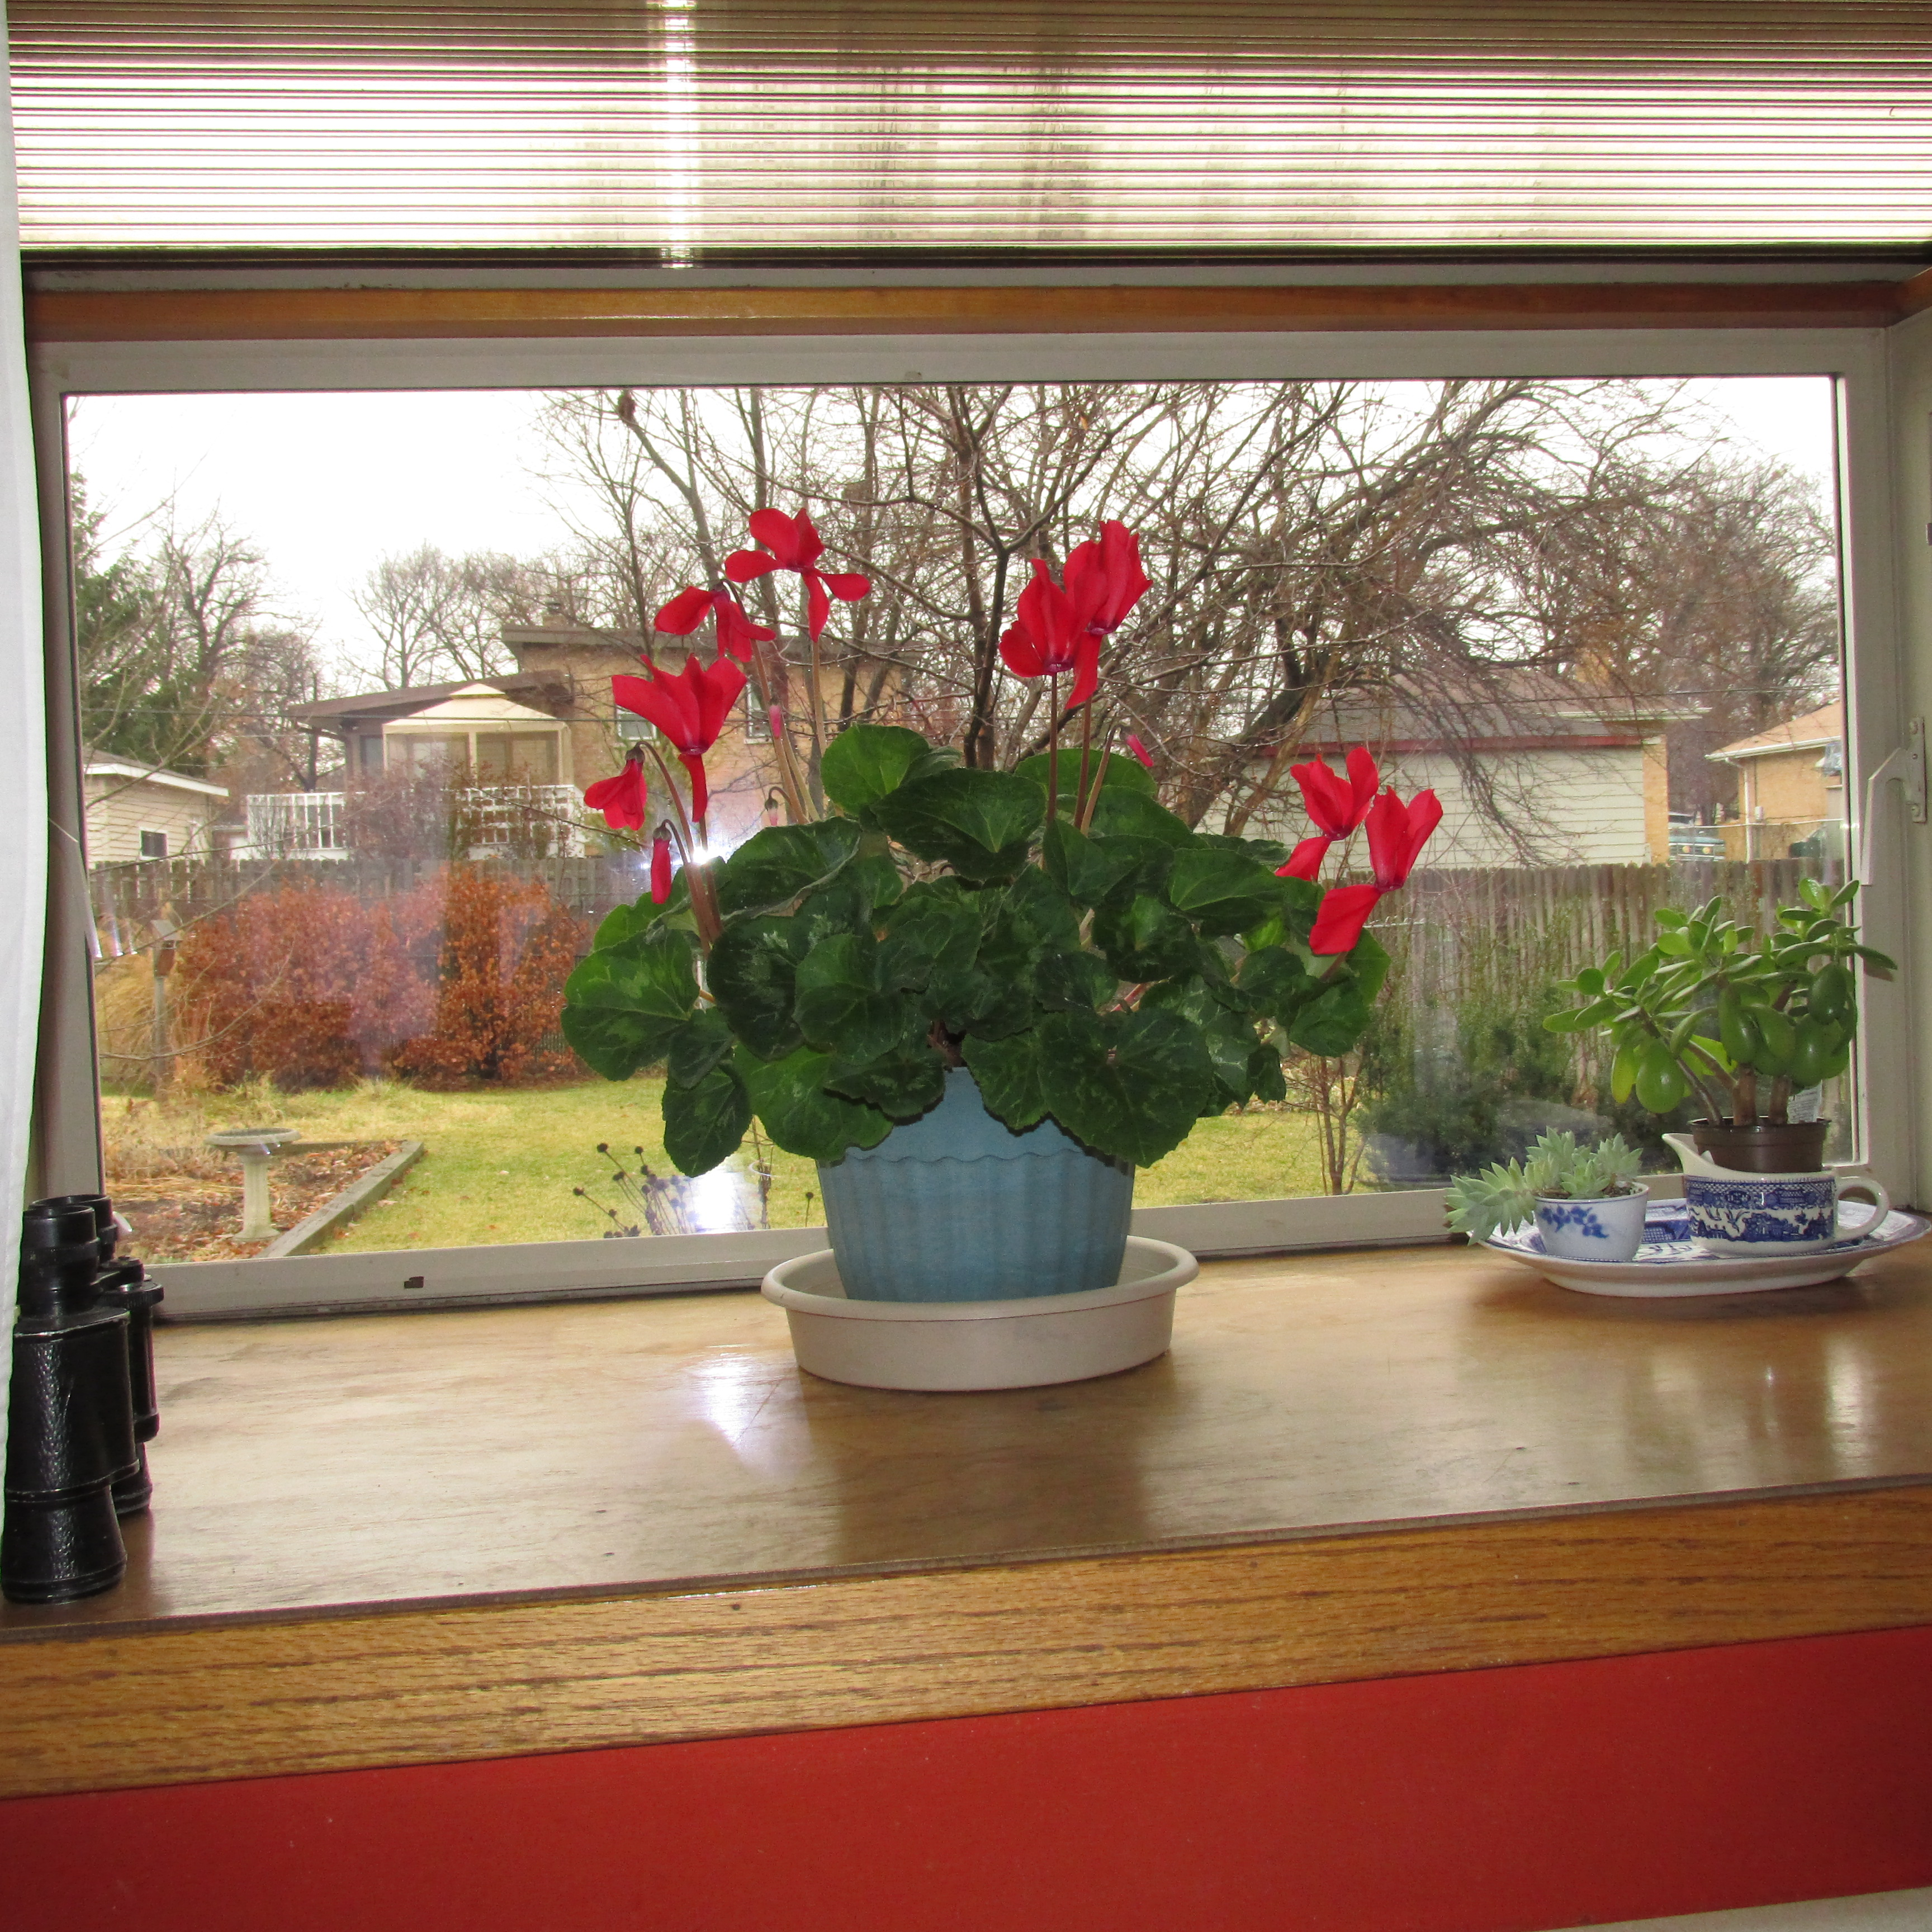 House Plants And A Beaver Lodge